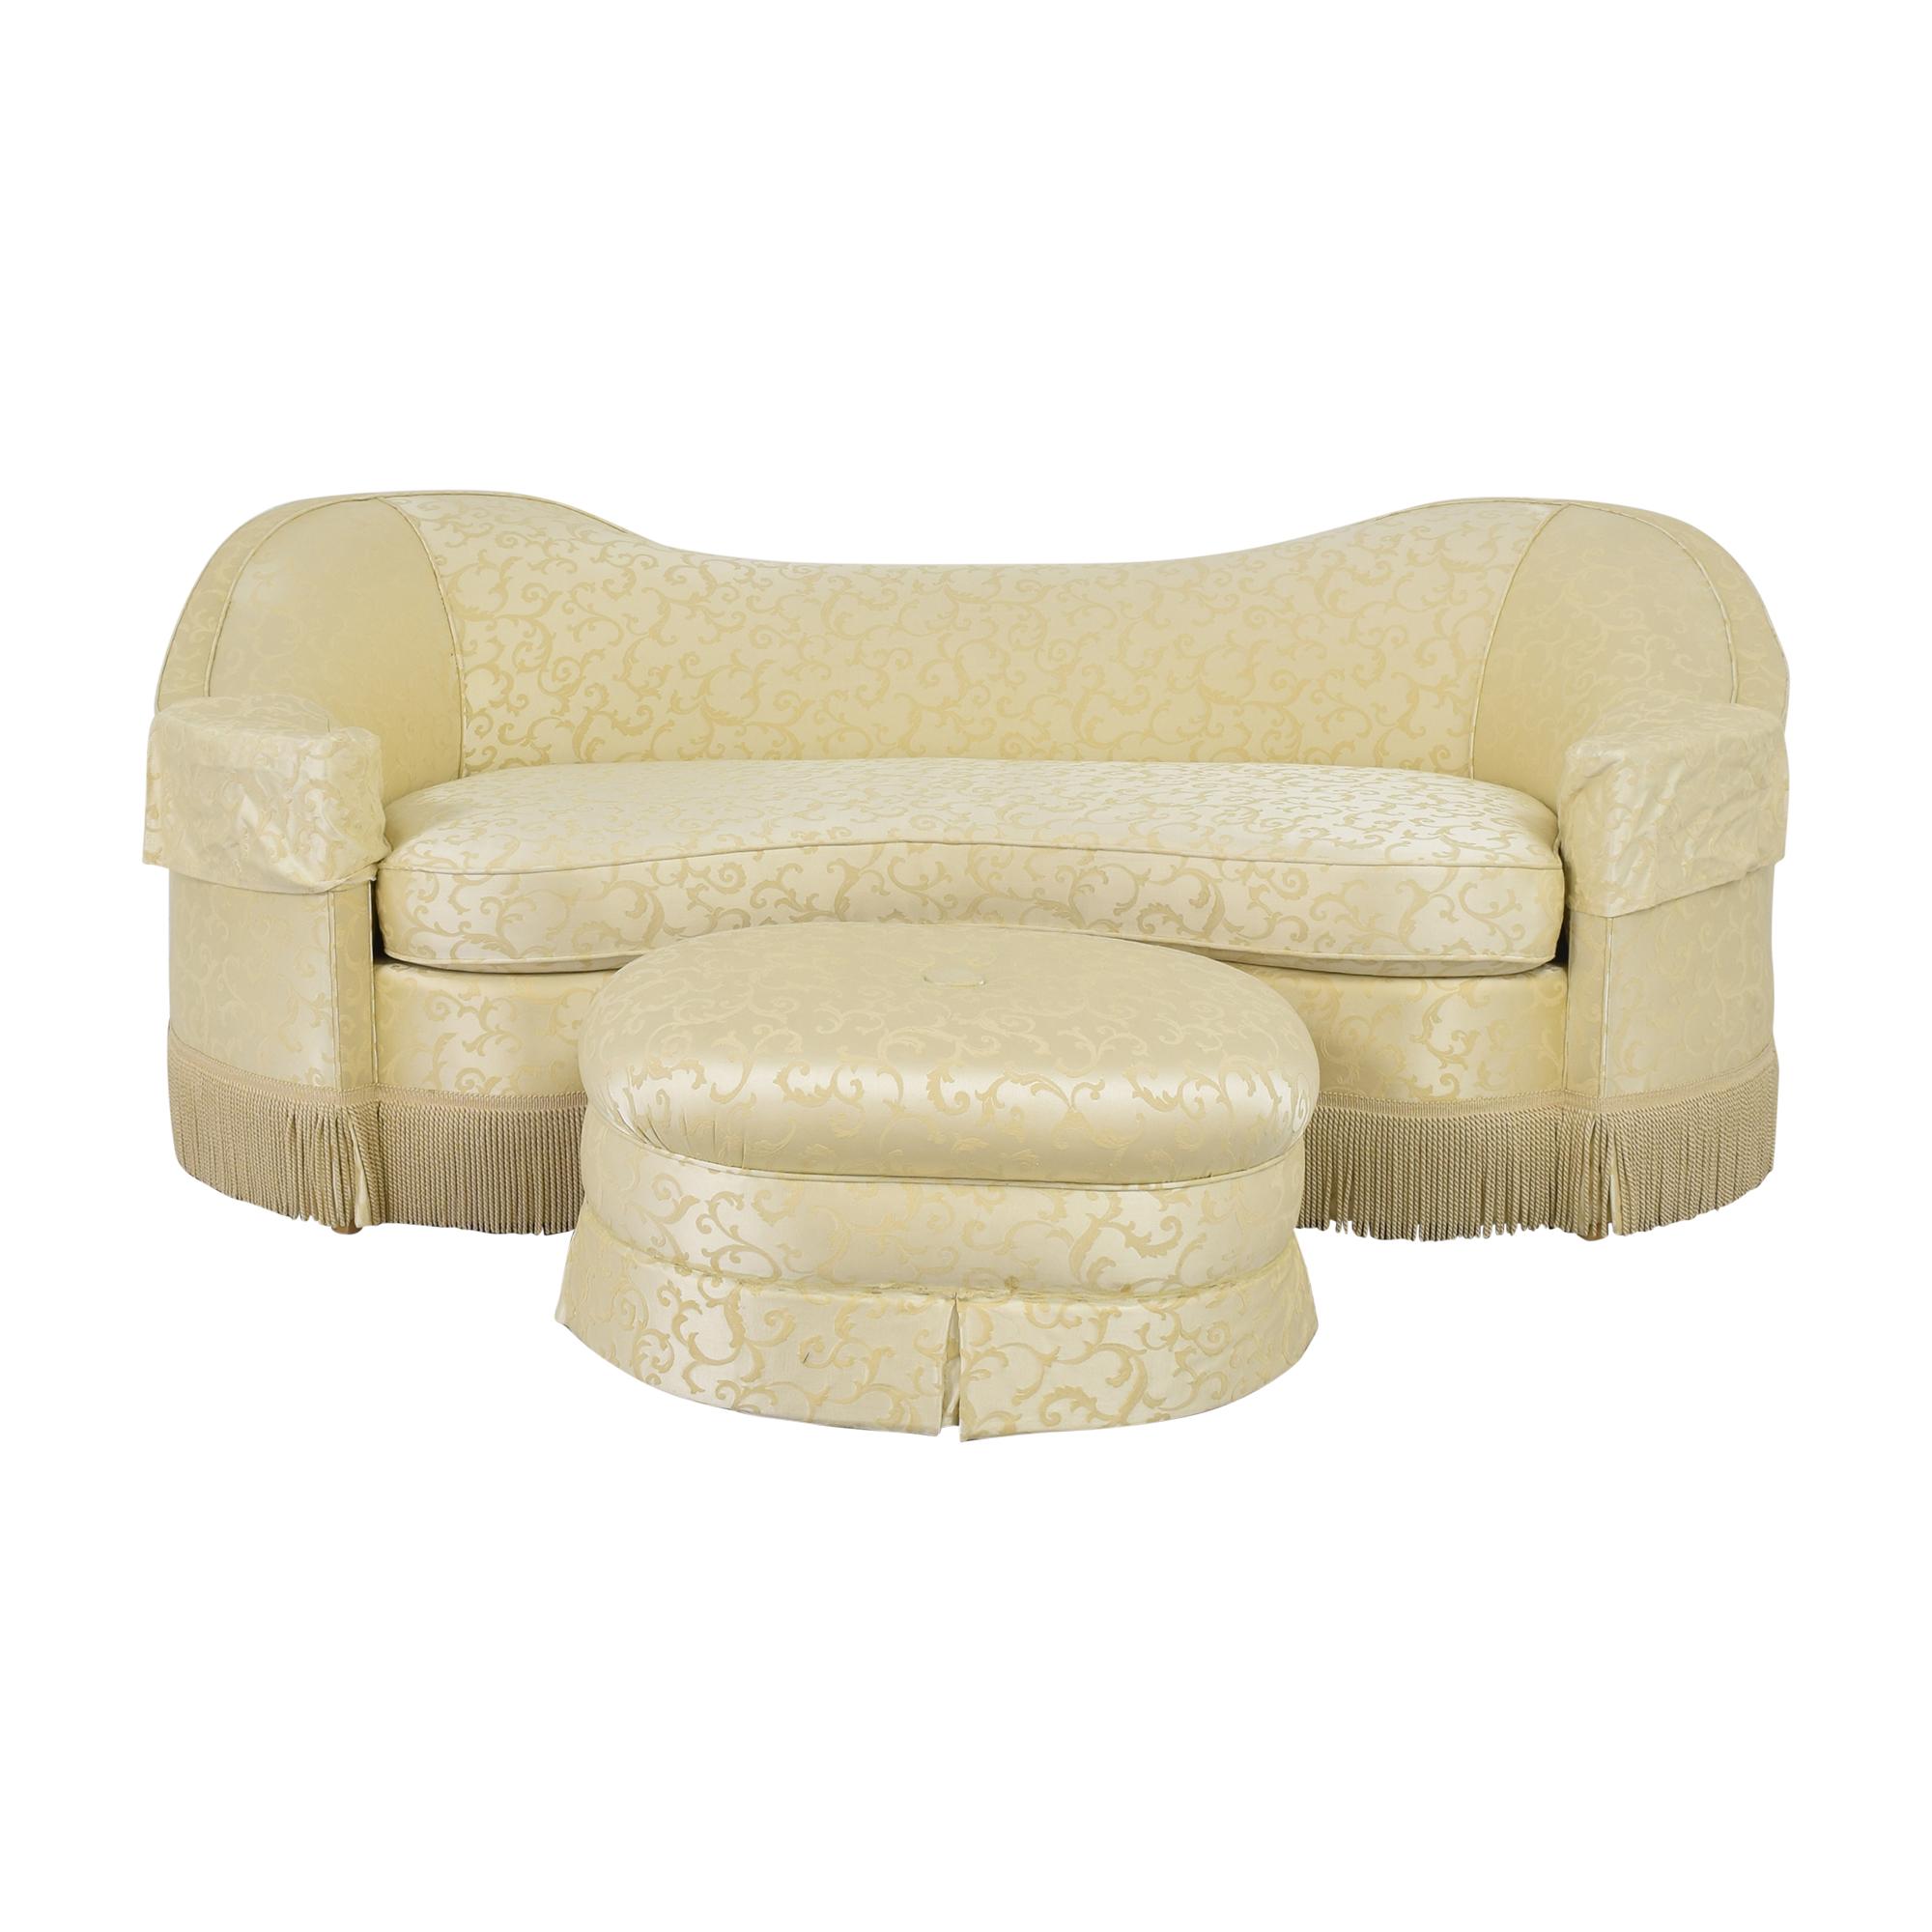 buy Custom Bench Cushion Sofa with Ottoman  Classic Sofas